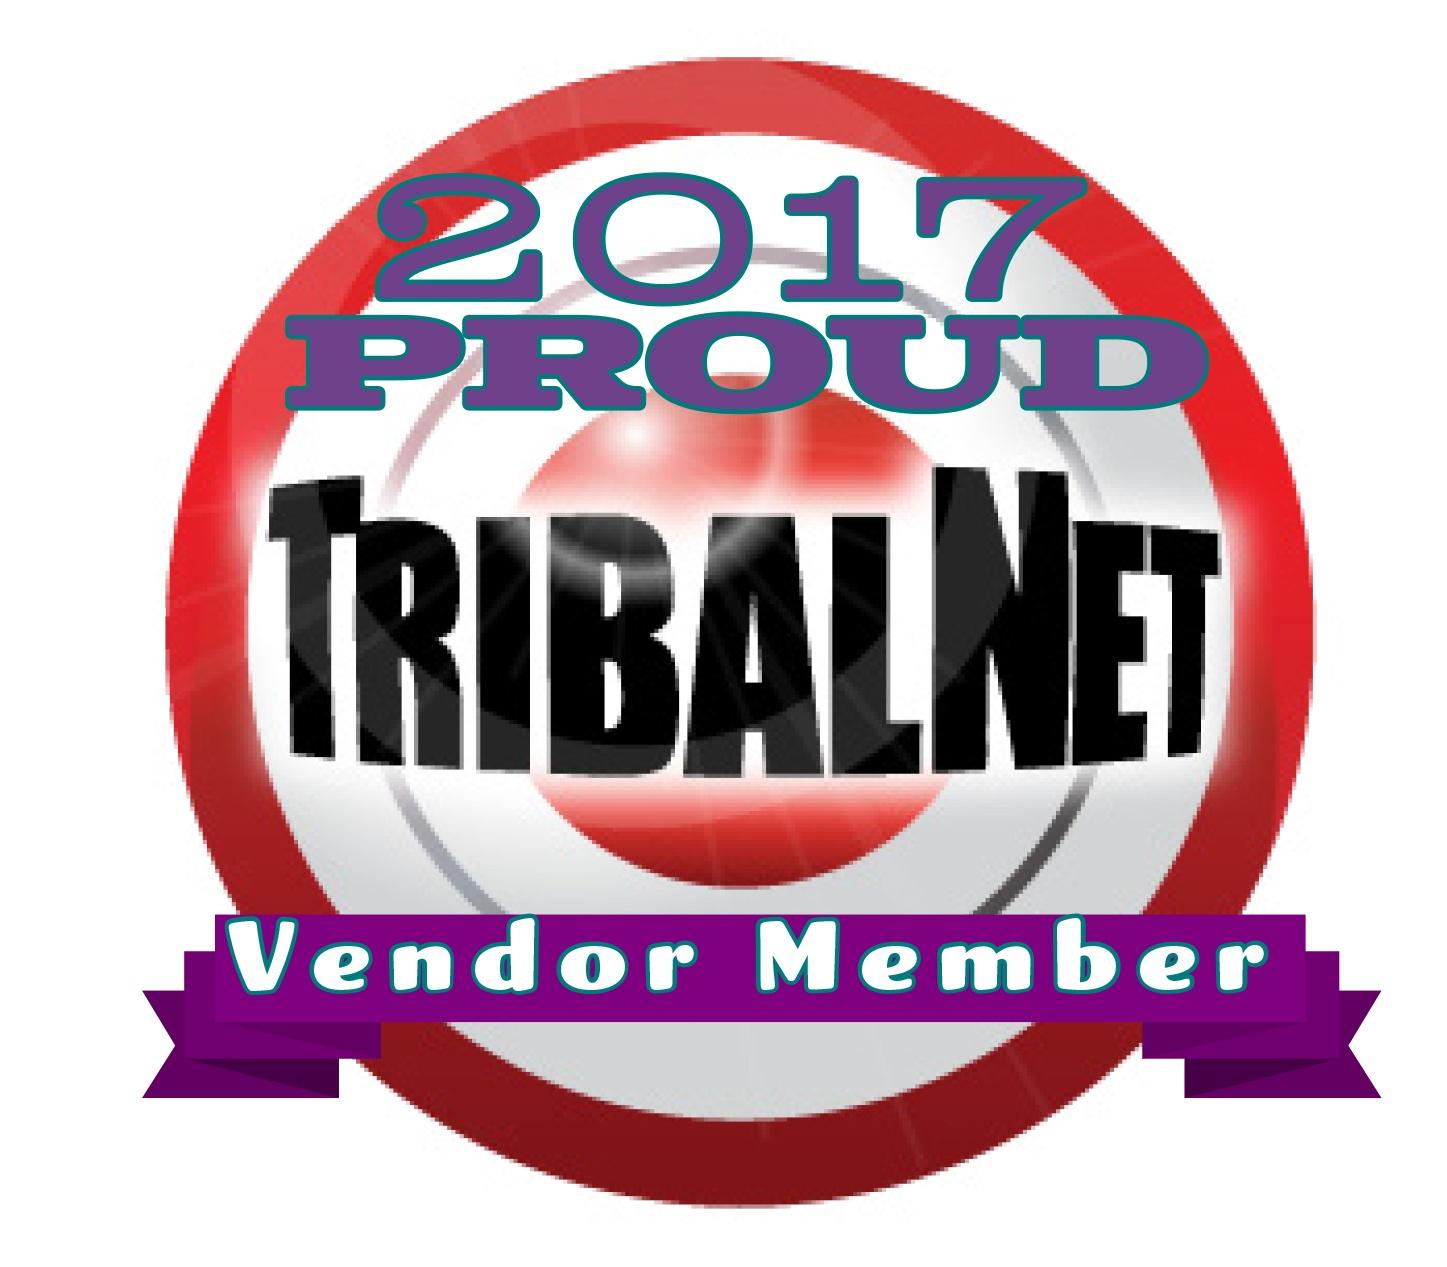 Vendor member logo 2017.jpg